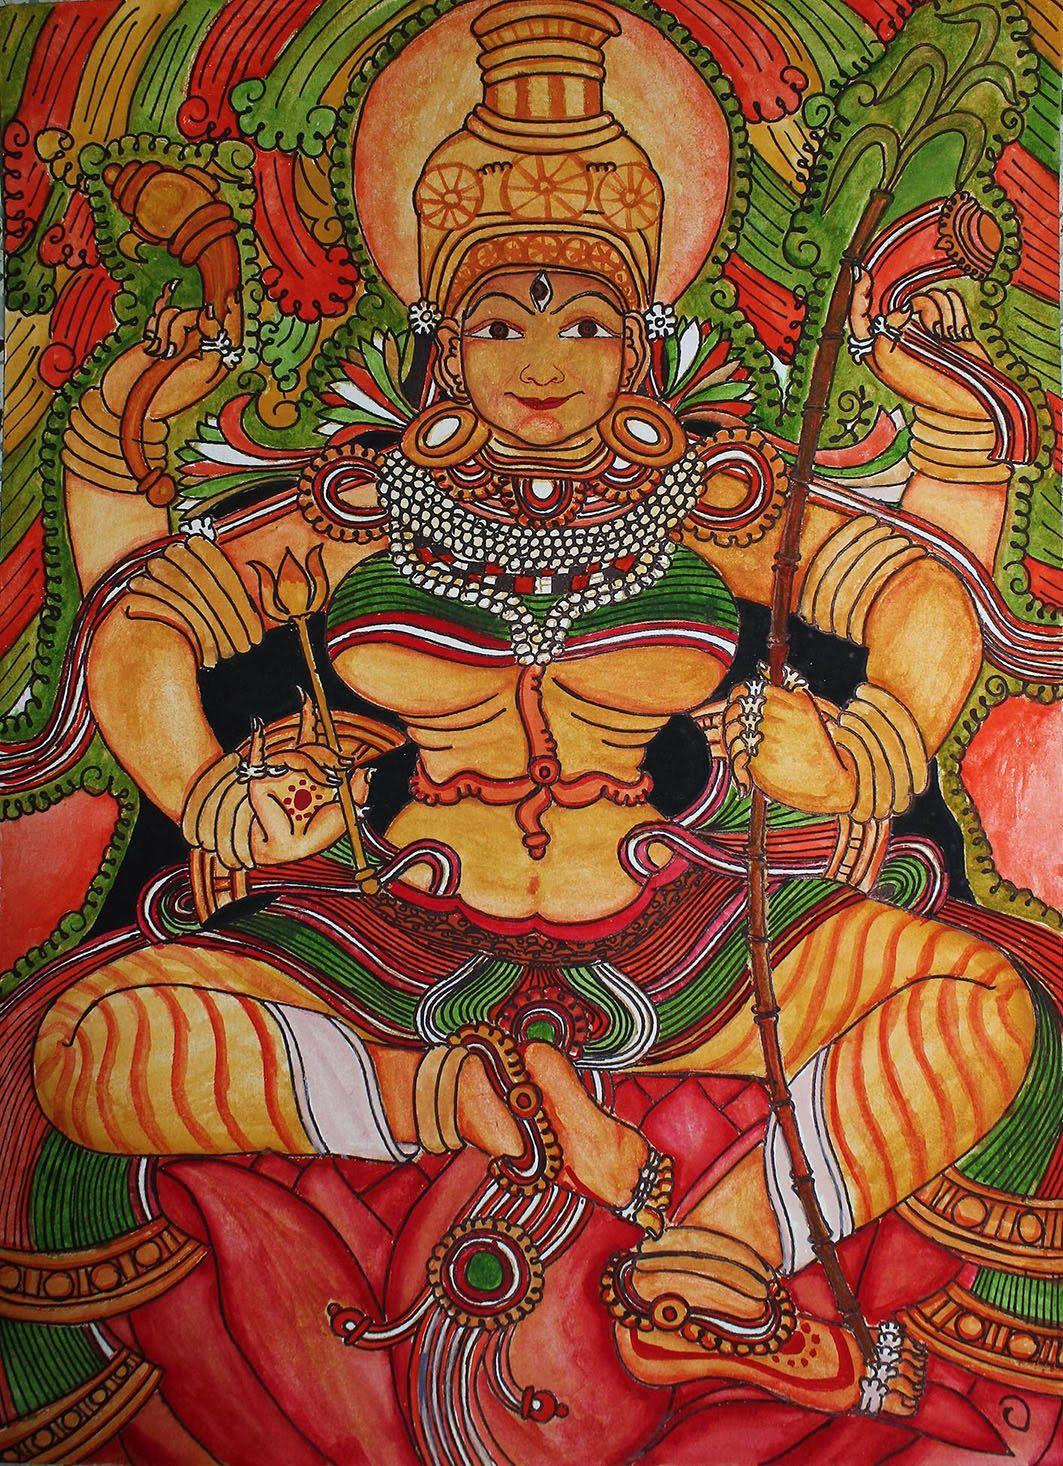 Kali as the Supreme Deity, circa 1800. Indra, Brahma, Vishnu and Shiva. Chamba, India. OM KRIM